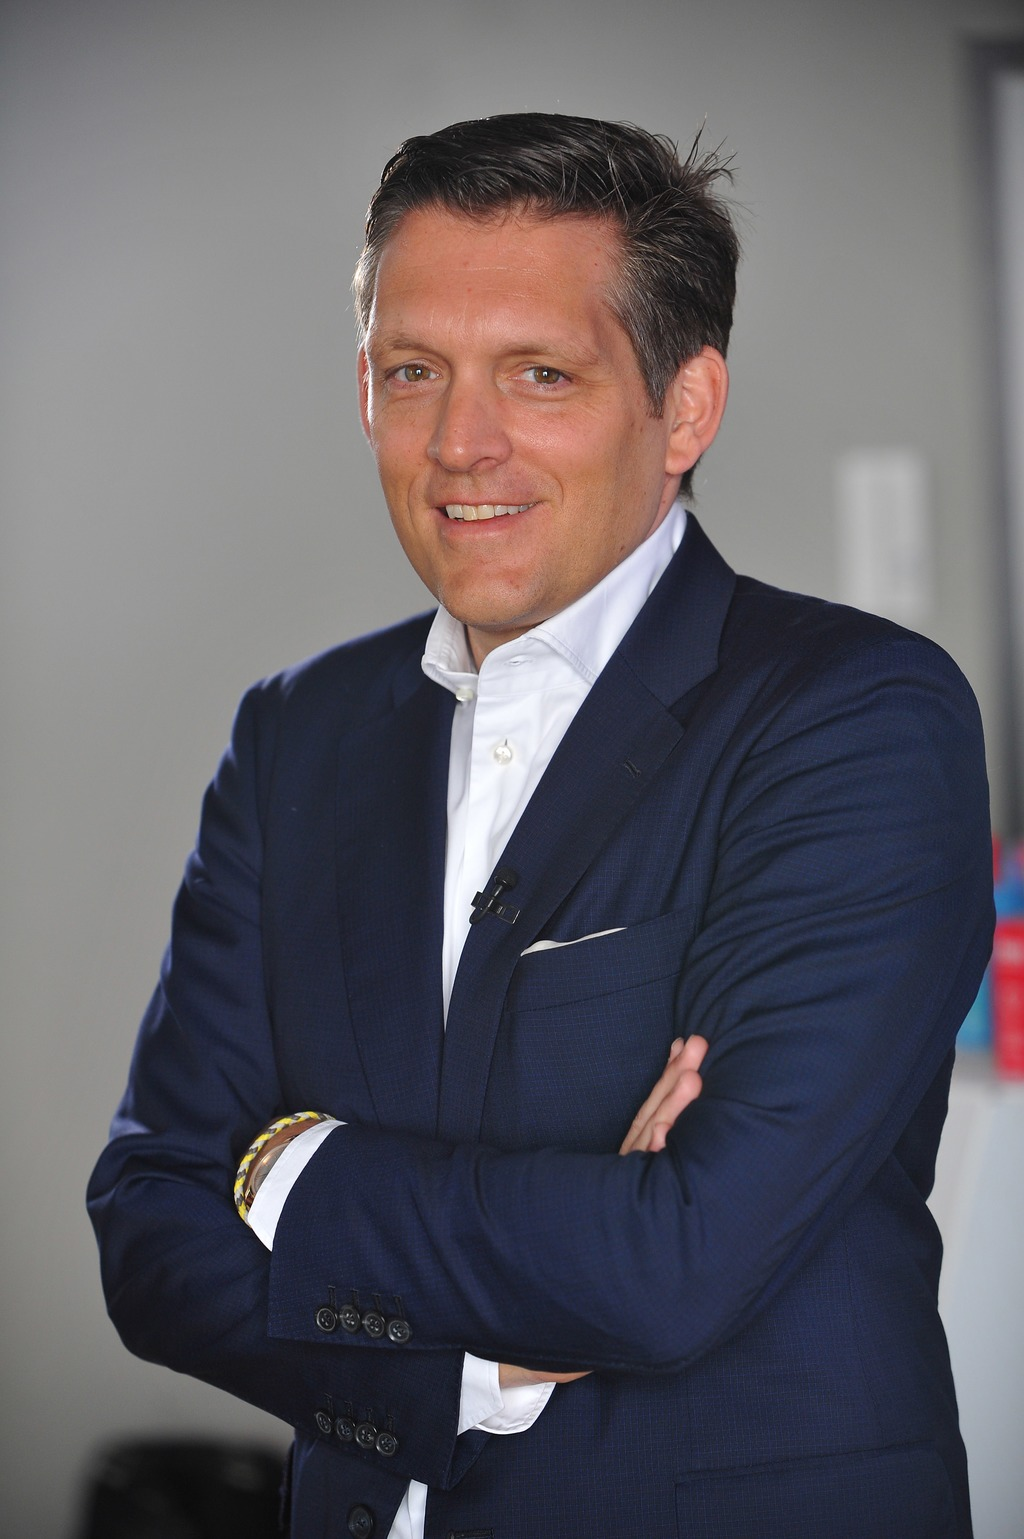 Eduard Dörrenberg